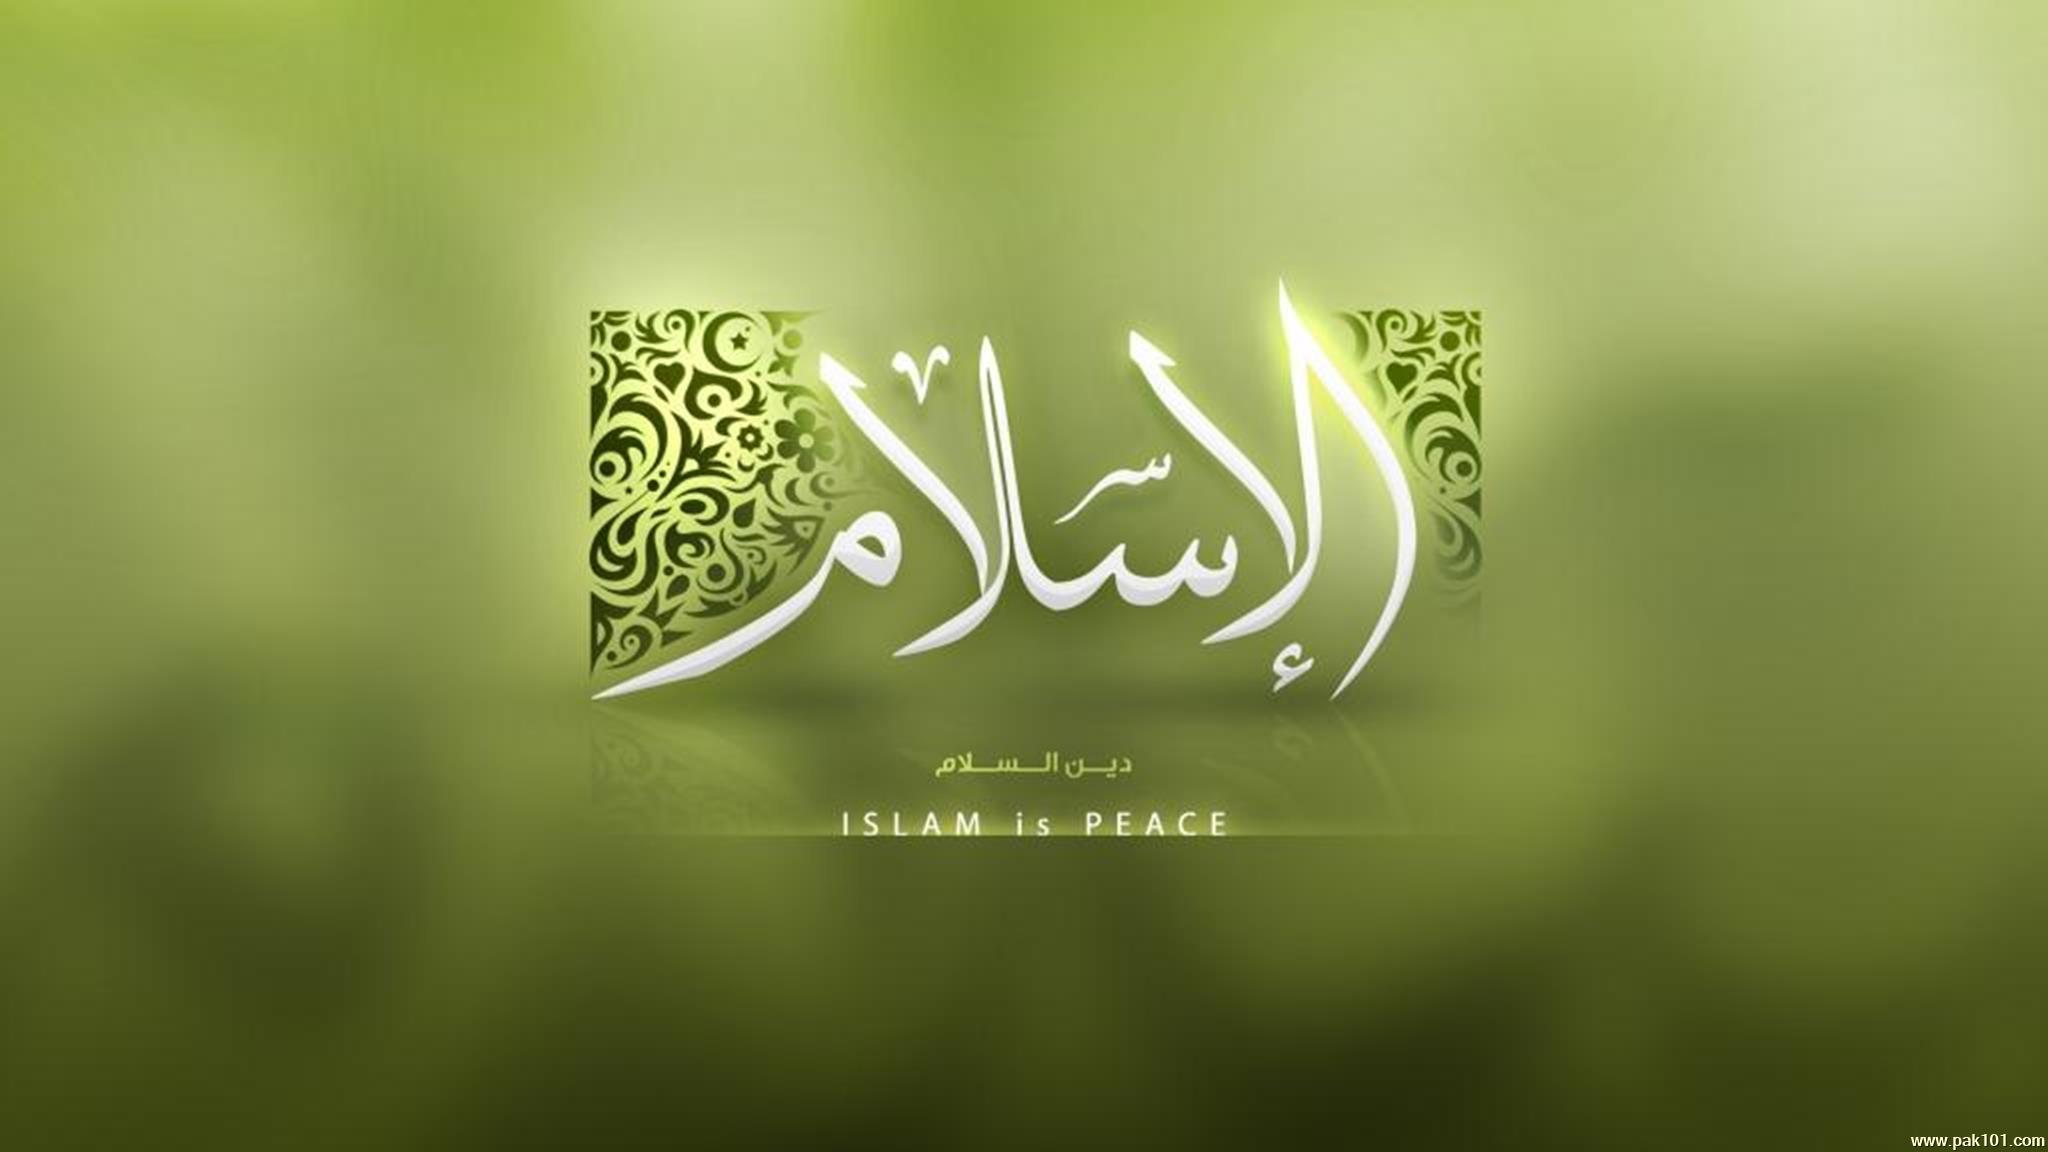 1600 X - 2560 By 1440 Islamic , HD Wallpaper & Backgrounds